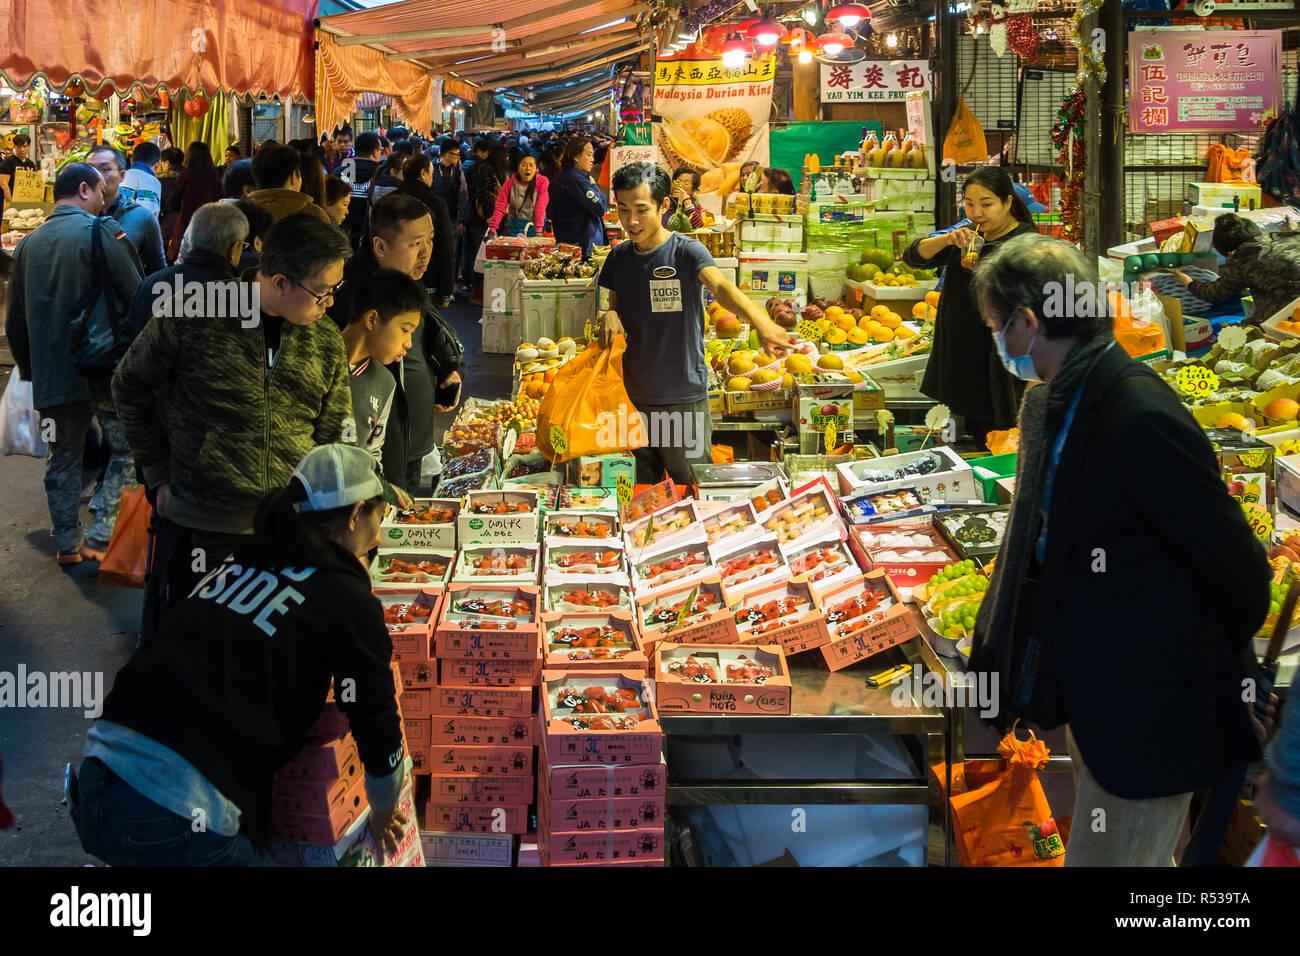 Wholesale Fruit Market Stock Photos & Wholesale Fruit Market